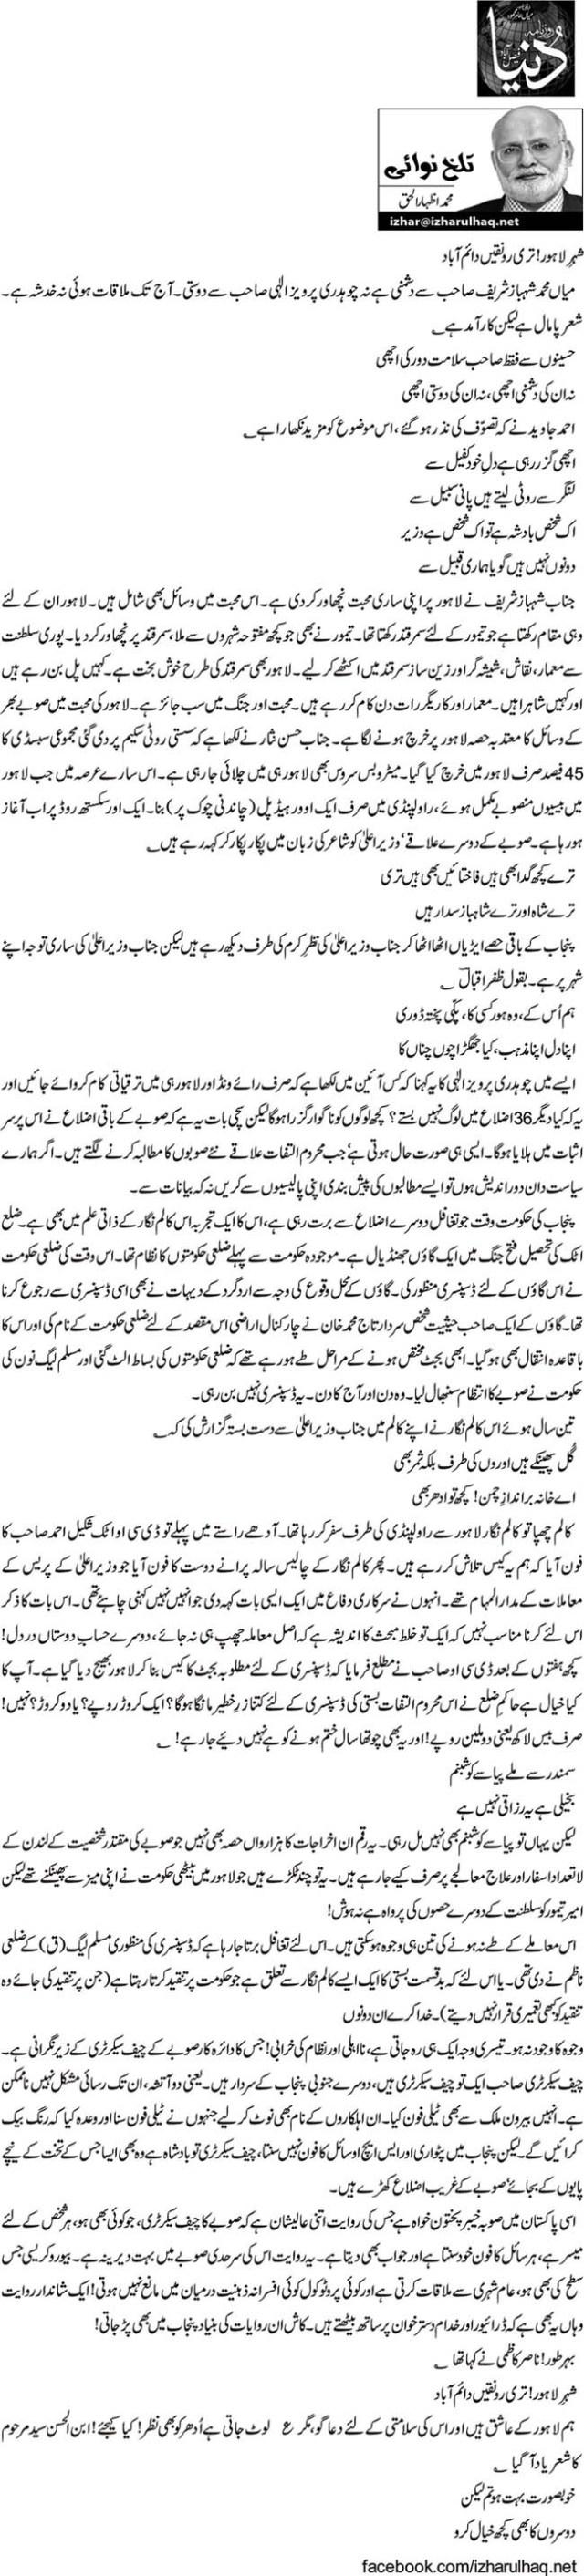 Shehr Lahore teri ronqe daaim abbad - M.Izhar ul Haq